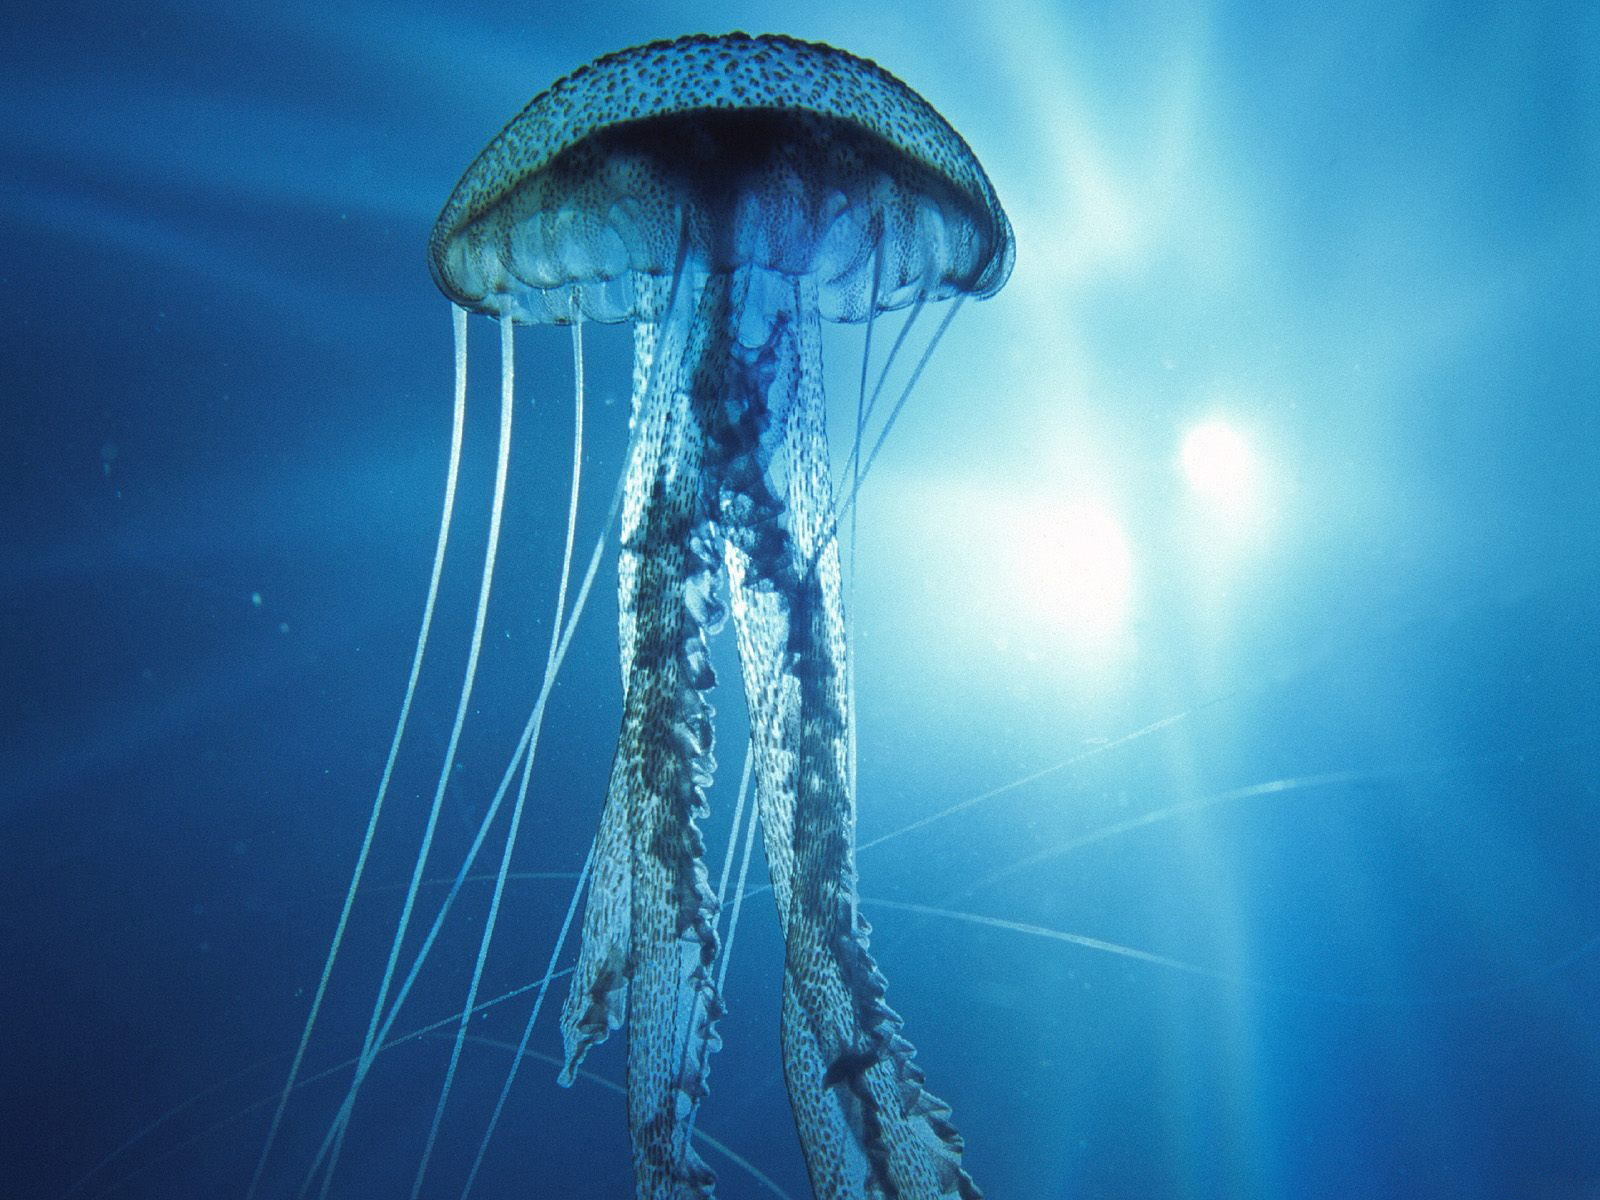 http://1.bp.blogspot.com/-VQjUTh10peI/TkrRpzxKK0I/AAAAAAAALko/EXywg-viMYM/s1600/Underwater+Wallpapers+%252822%2529.jpg